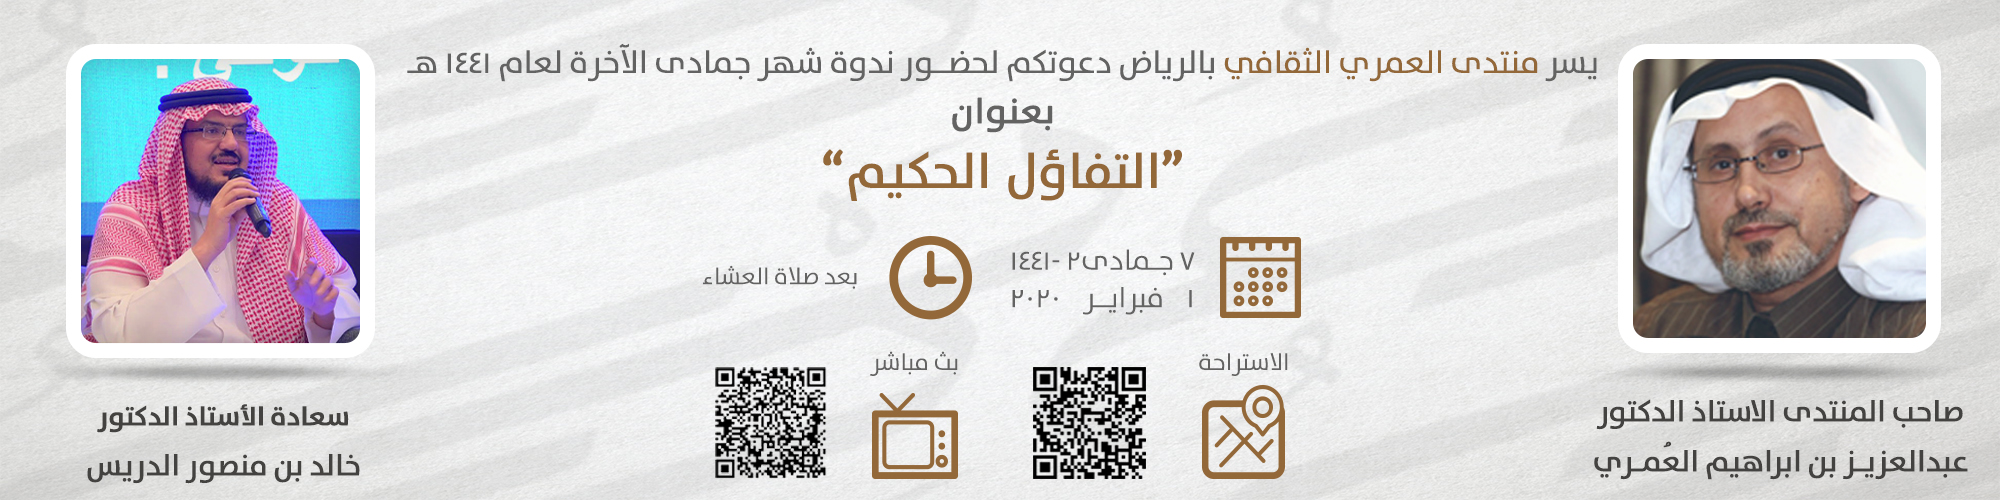 http://omaryforum.com/wp-content/uploads/2020/01/تصميم-ندوة-التفاؤل-الحكيم.jpg